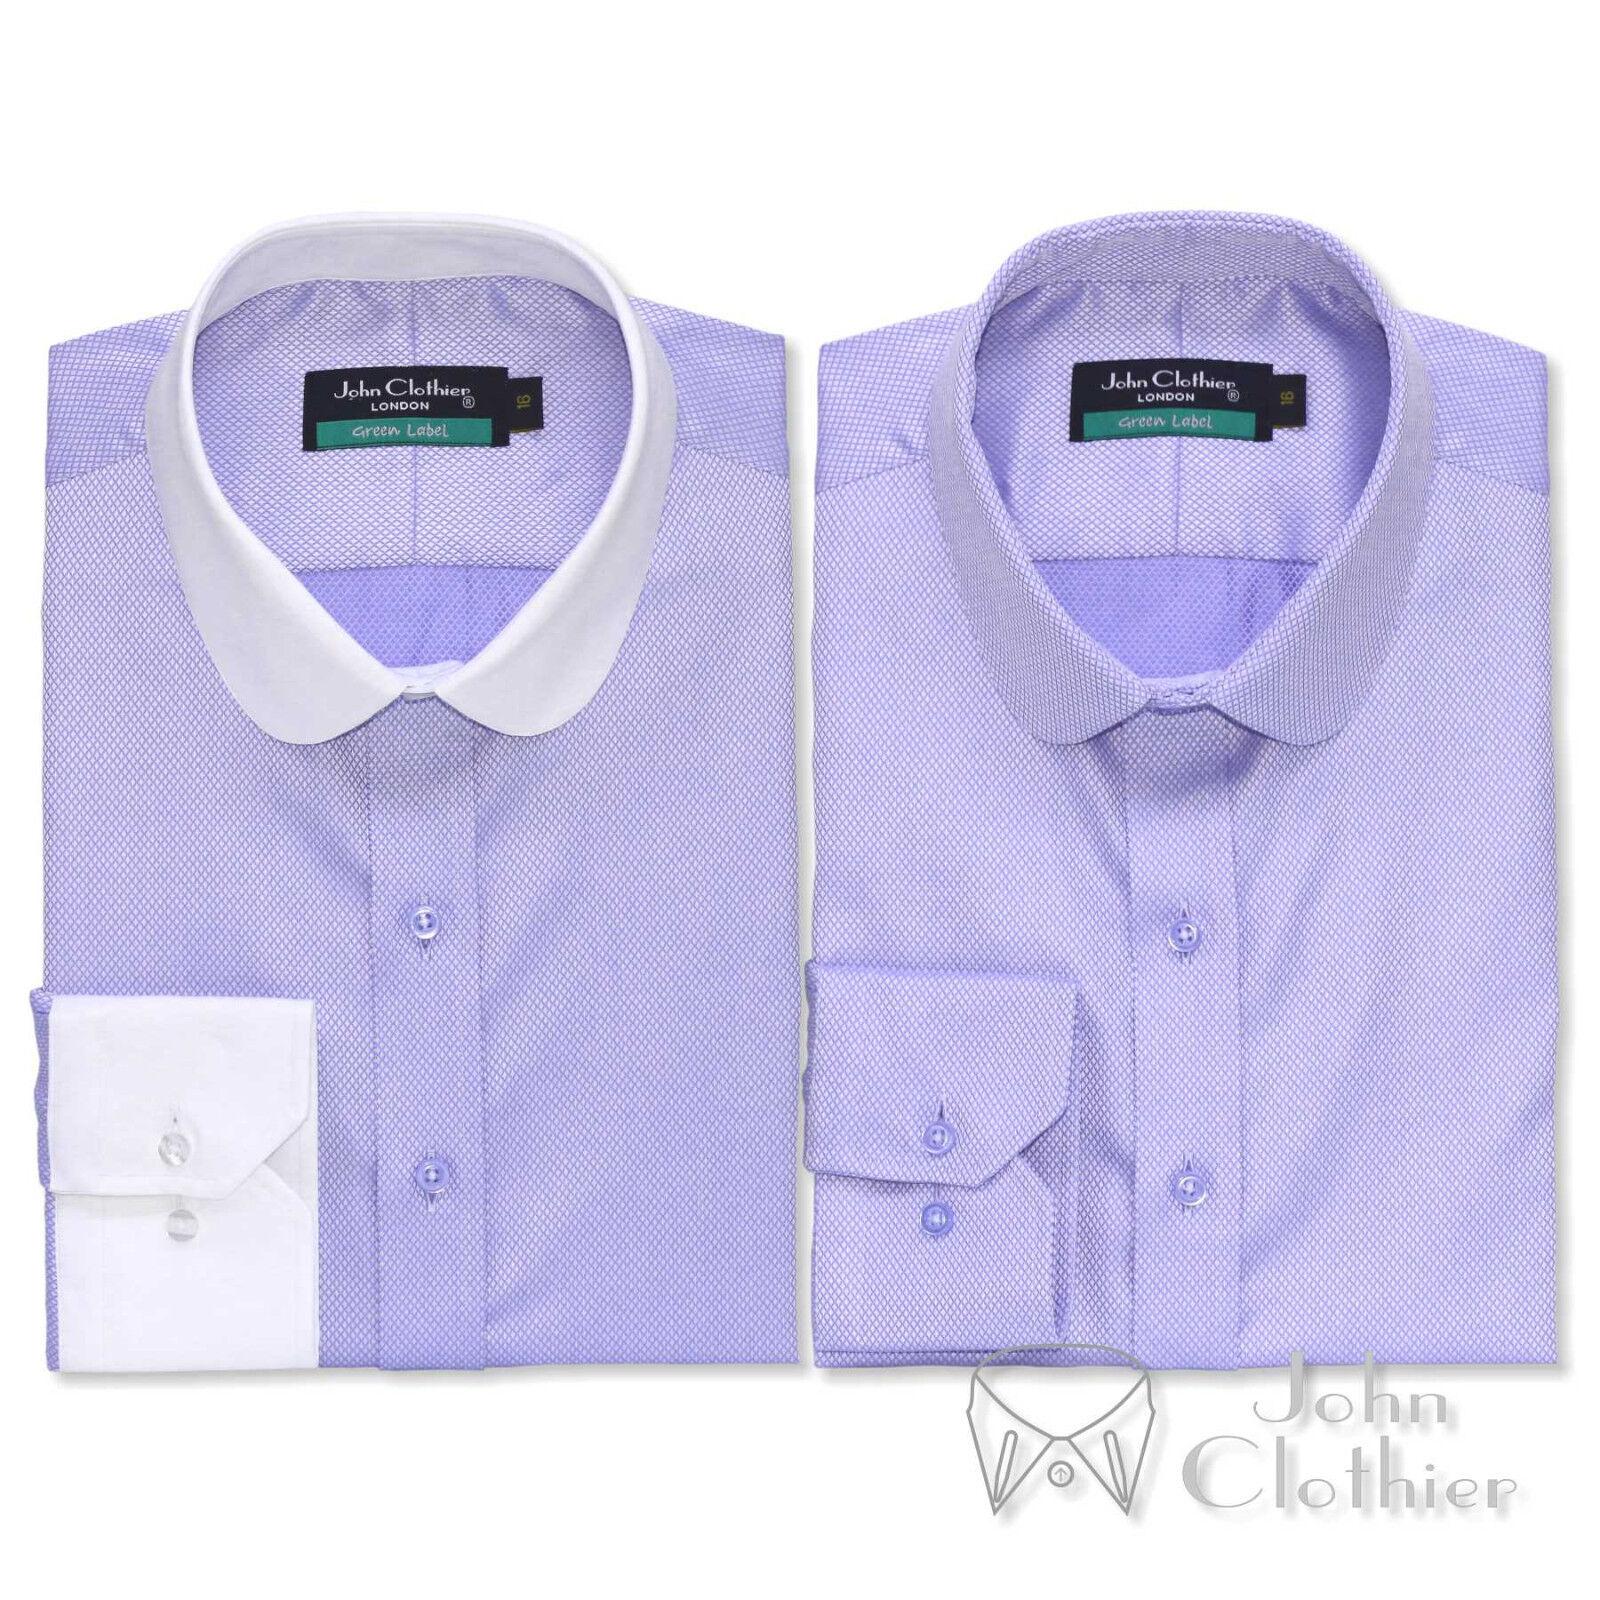 Herren Cotton Penny collar shirt Lilac lila diamond dobby Club collar Gent Round